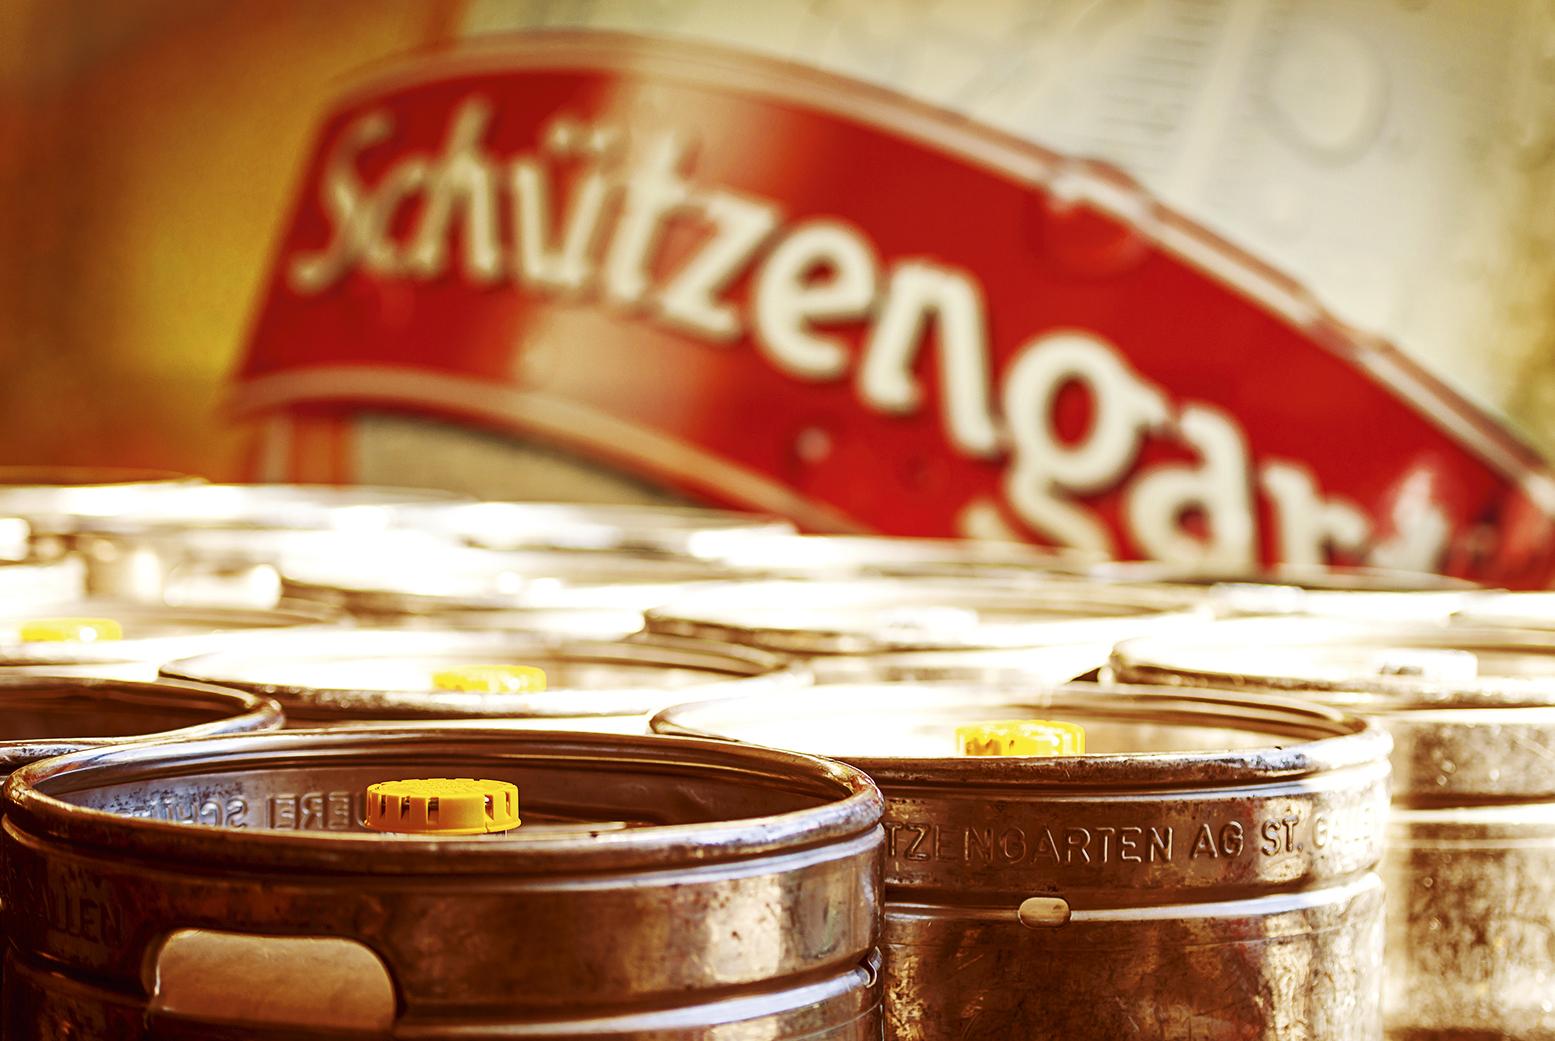 Schützengarten Getränke-Markt